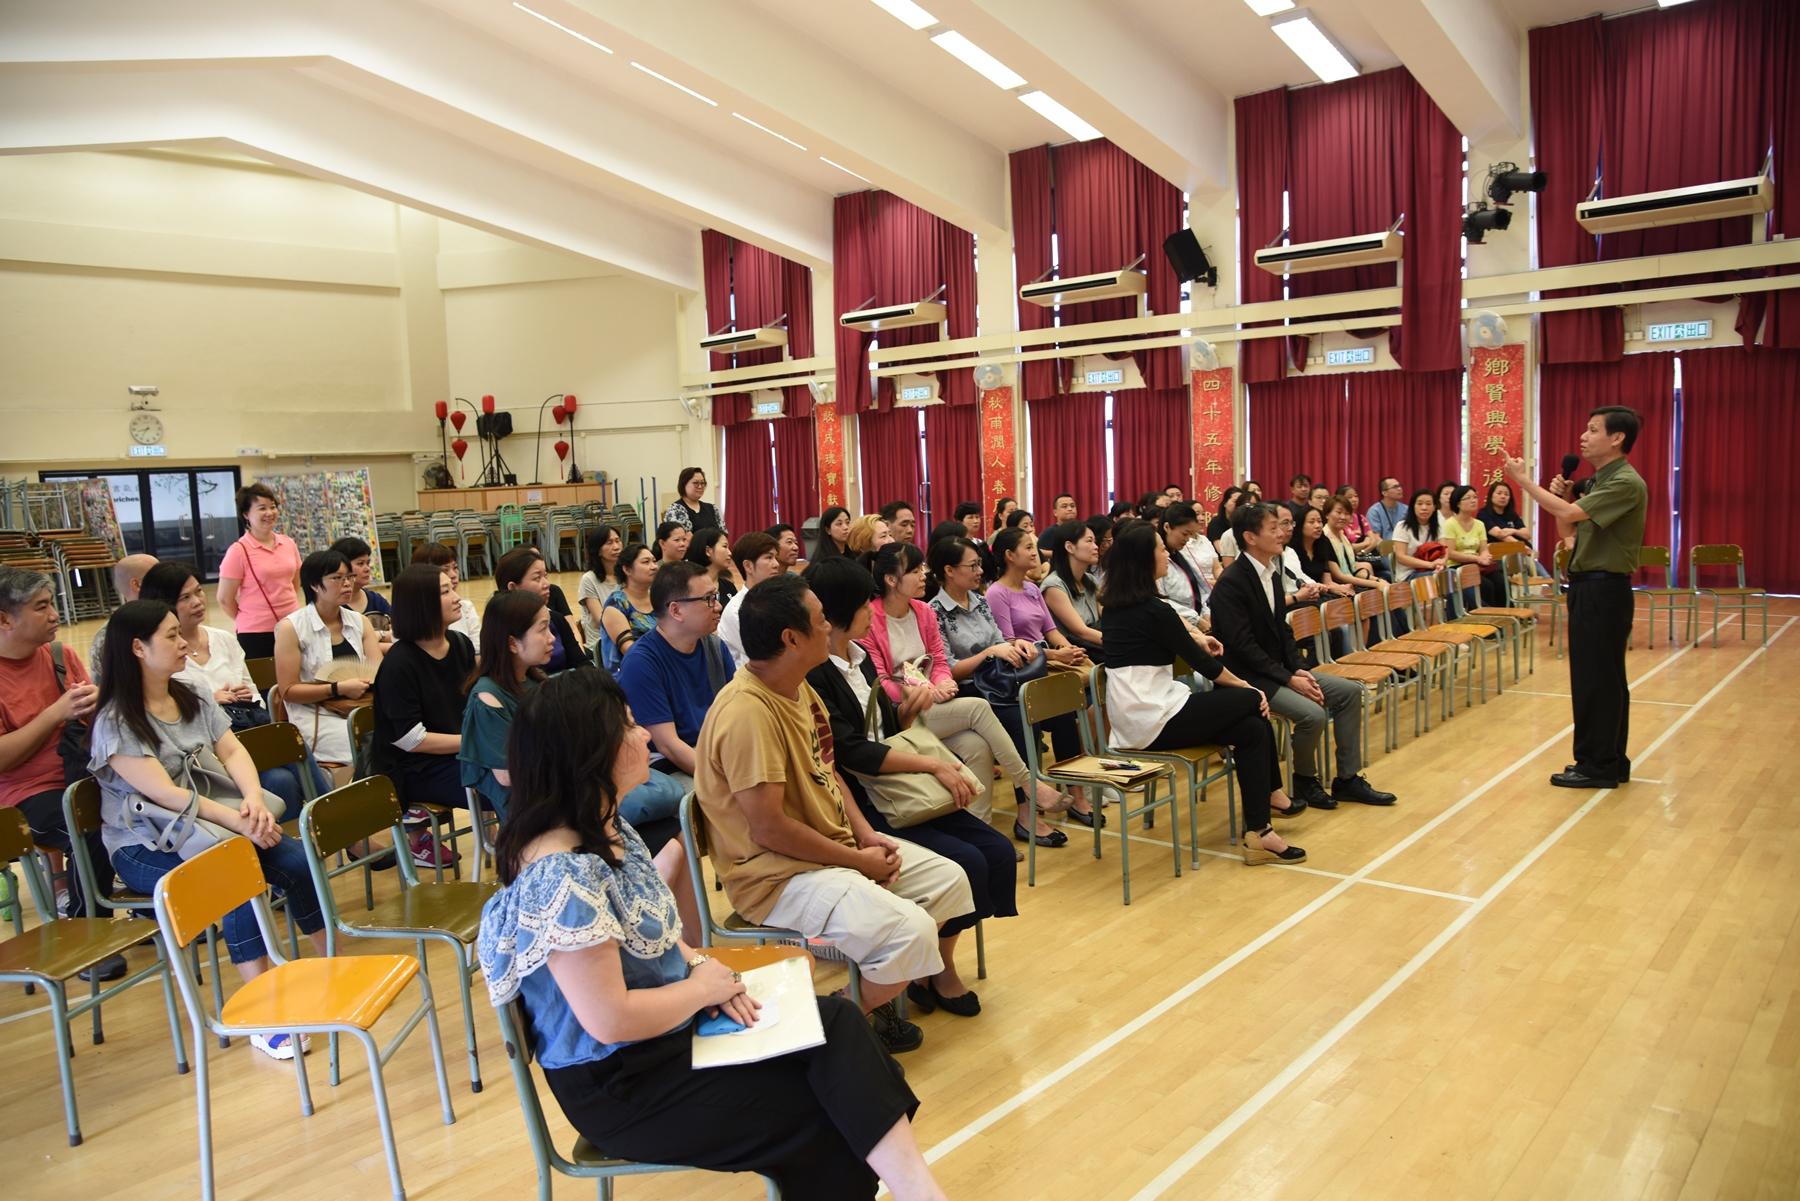 http://www.npc.edu.hk/sites/default/files/10_226.jpg